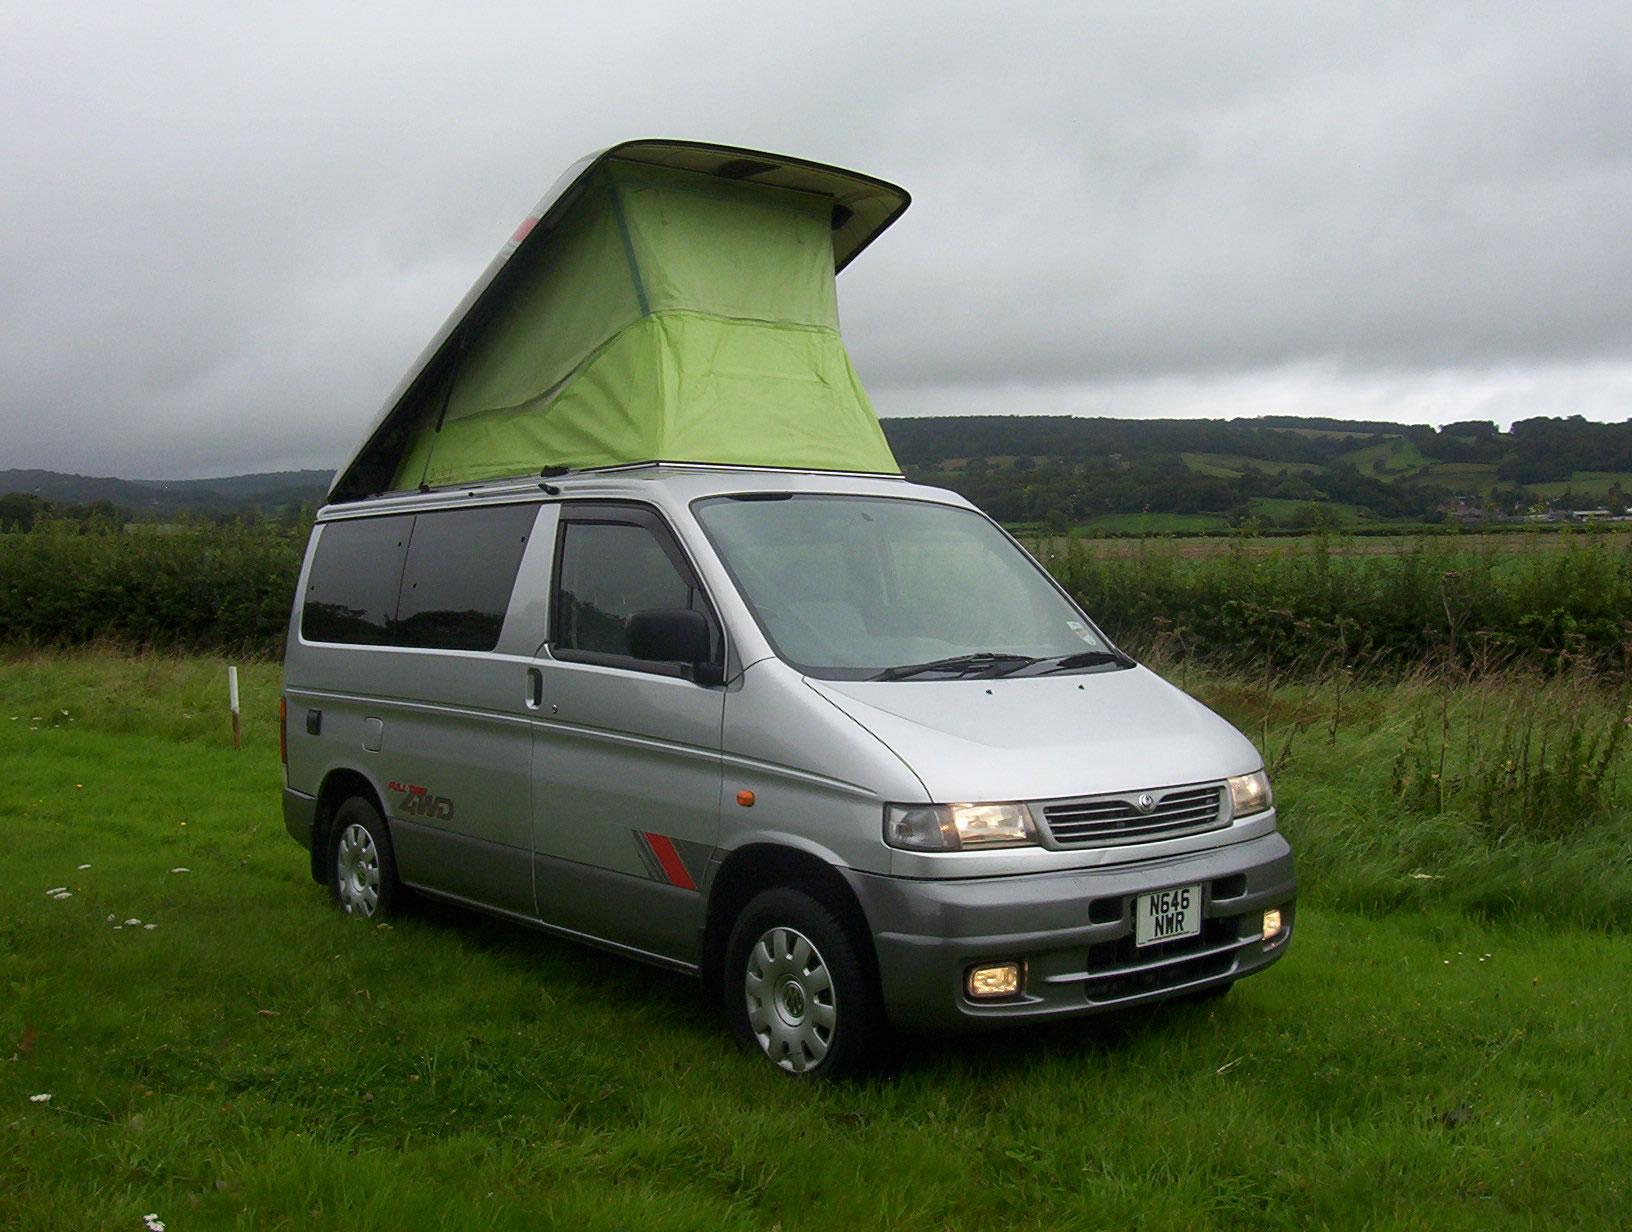 mazda bongo camper van sales conversions spares and. Black Bedroom Furniture Sets. Home Design Ideas